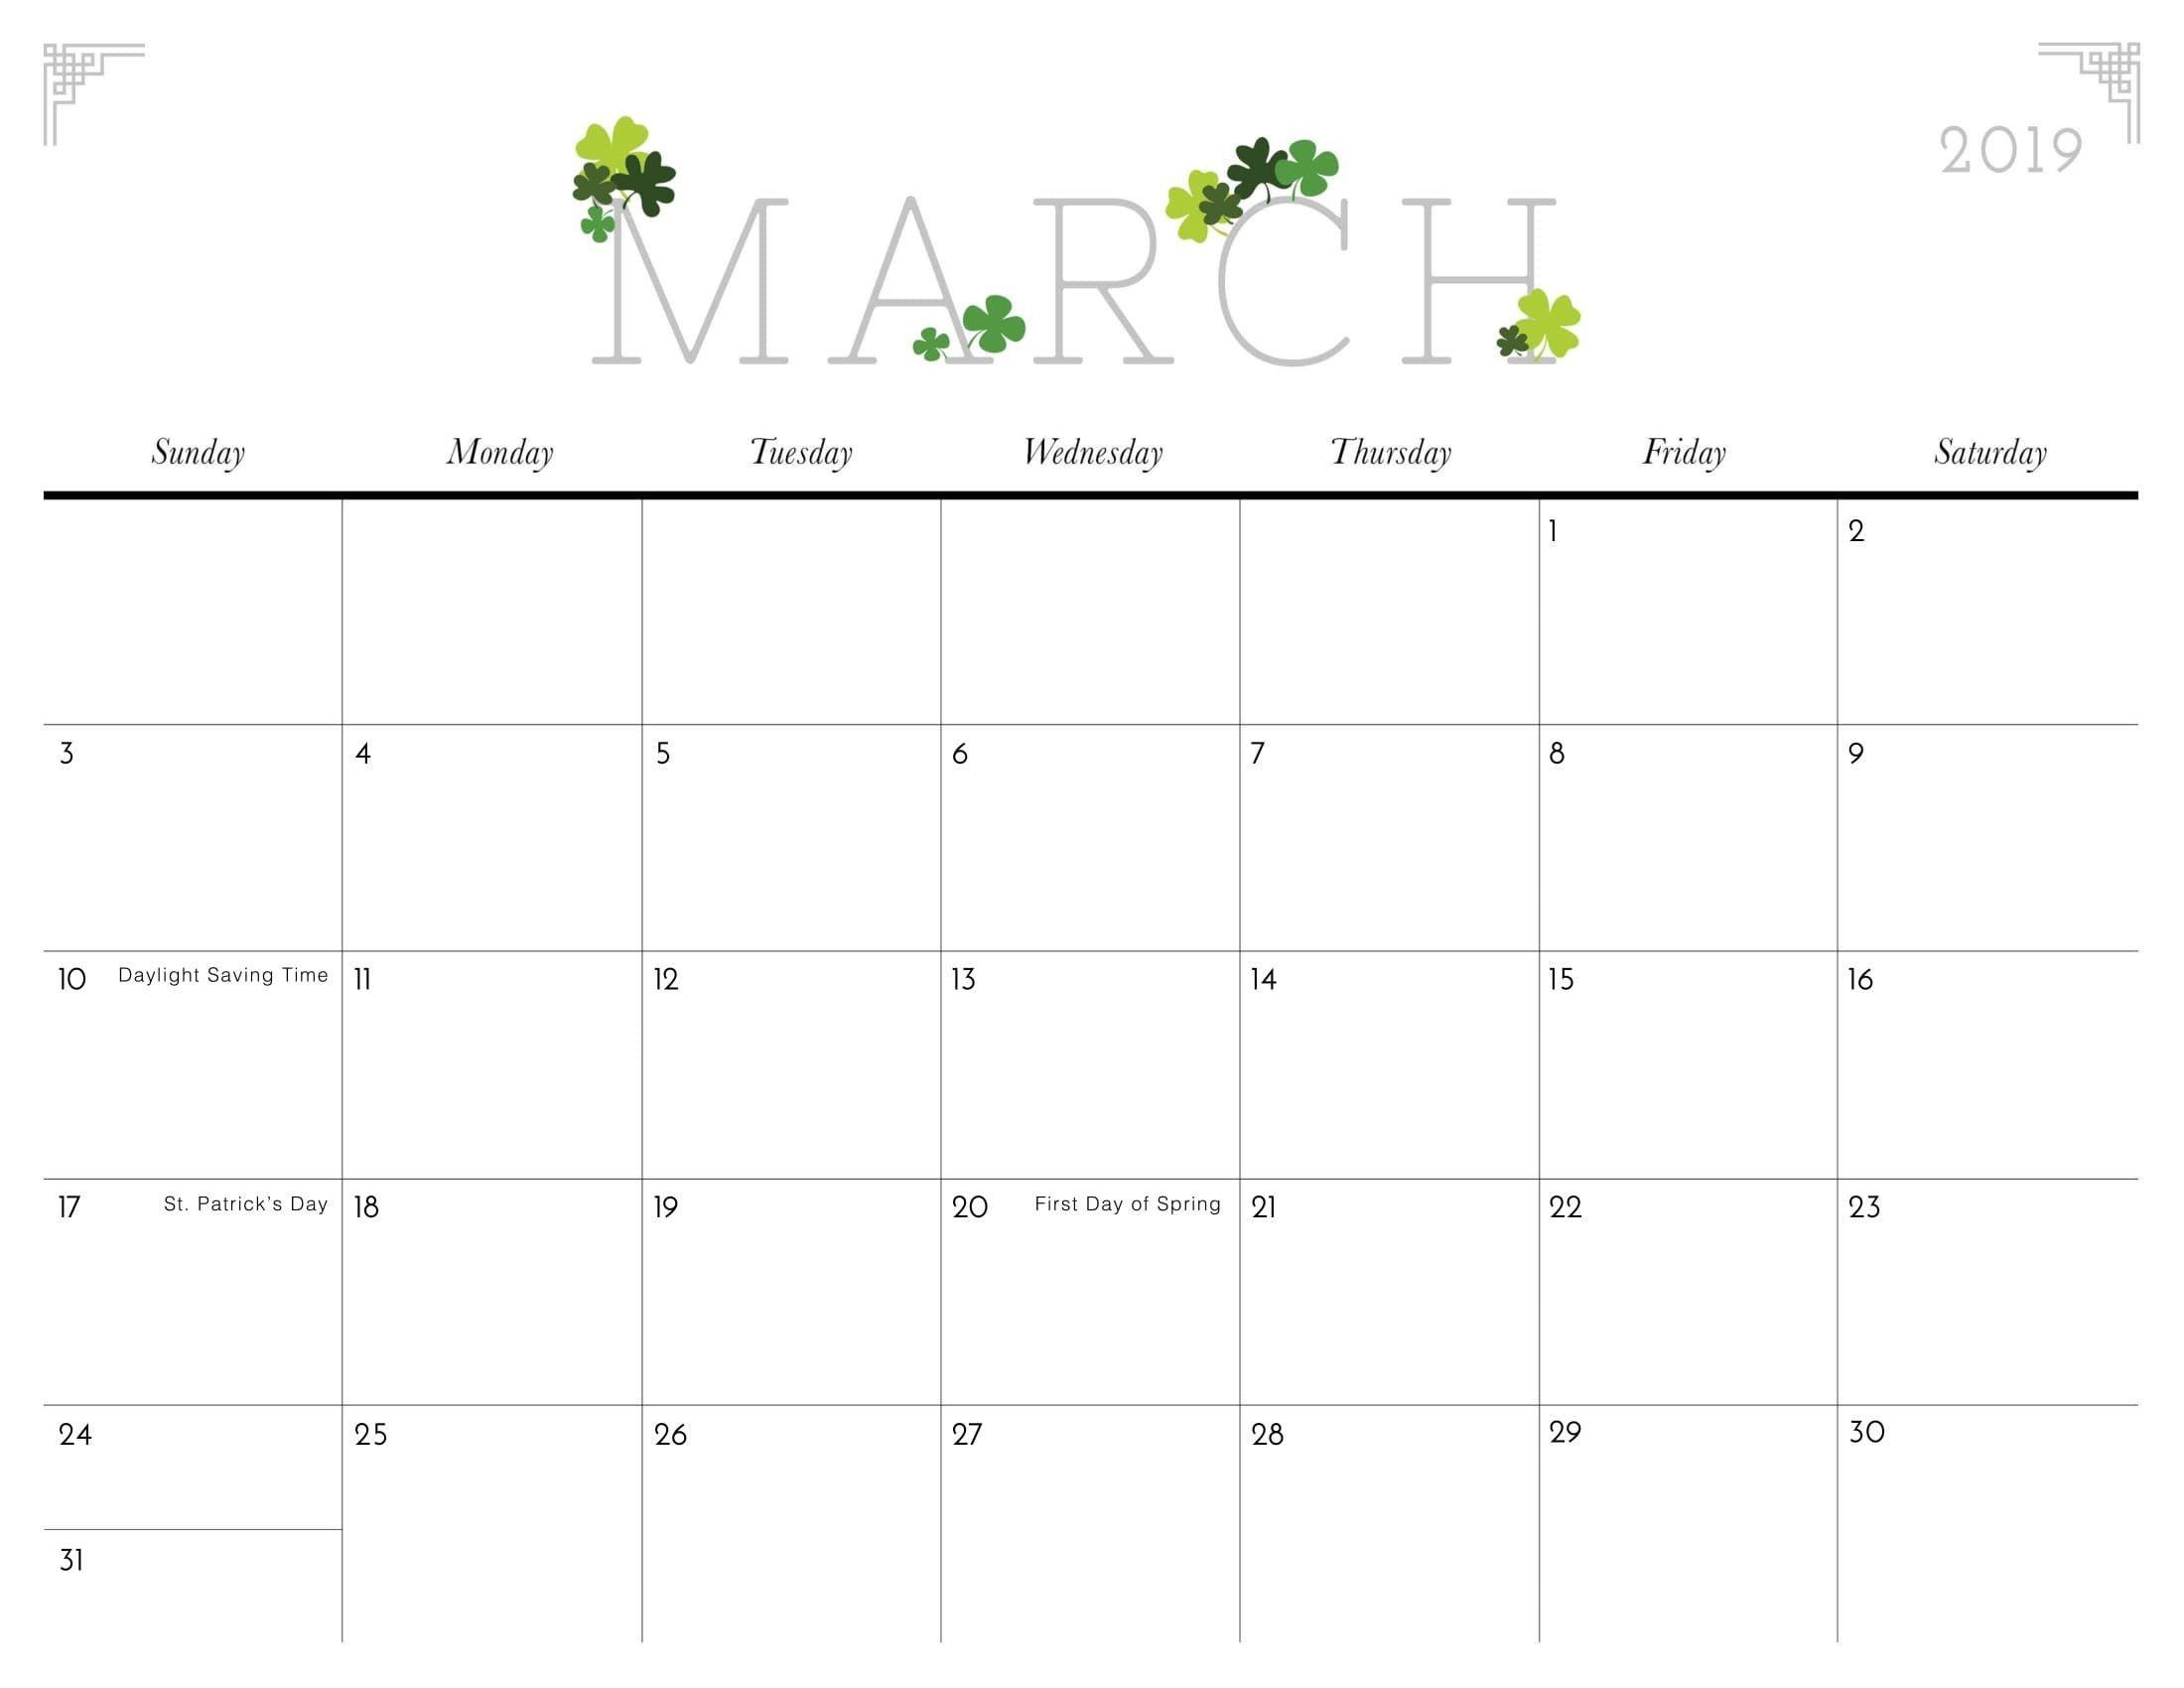 Empty March Calendar Más Reciente Cute March 2019 Calendar Template Of Empty March Calendar Más Actual the Ideal Instance E S Blank Calendar Templates July 2018